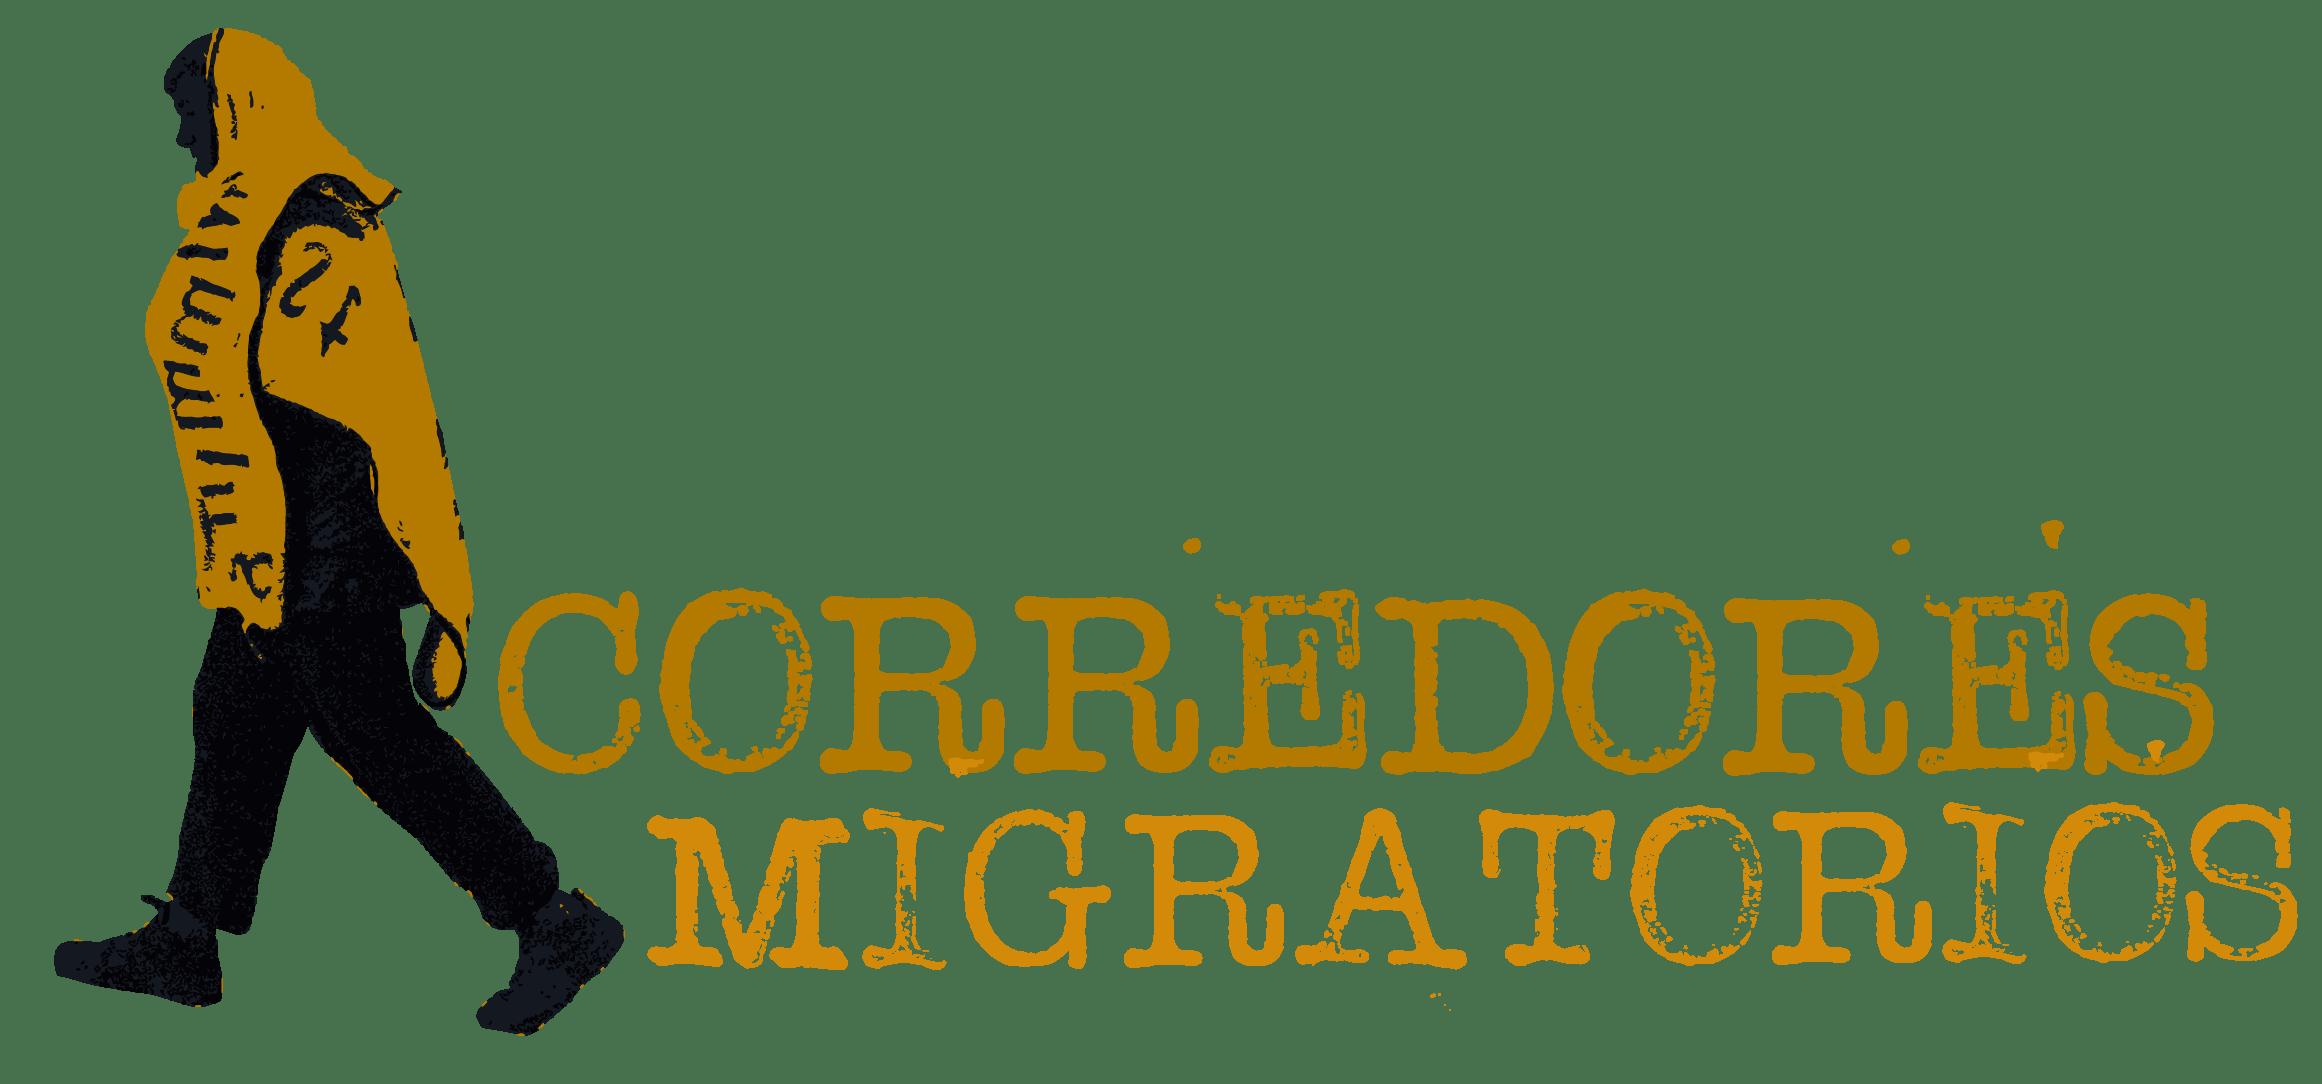 Corredores Migratorios